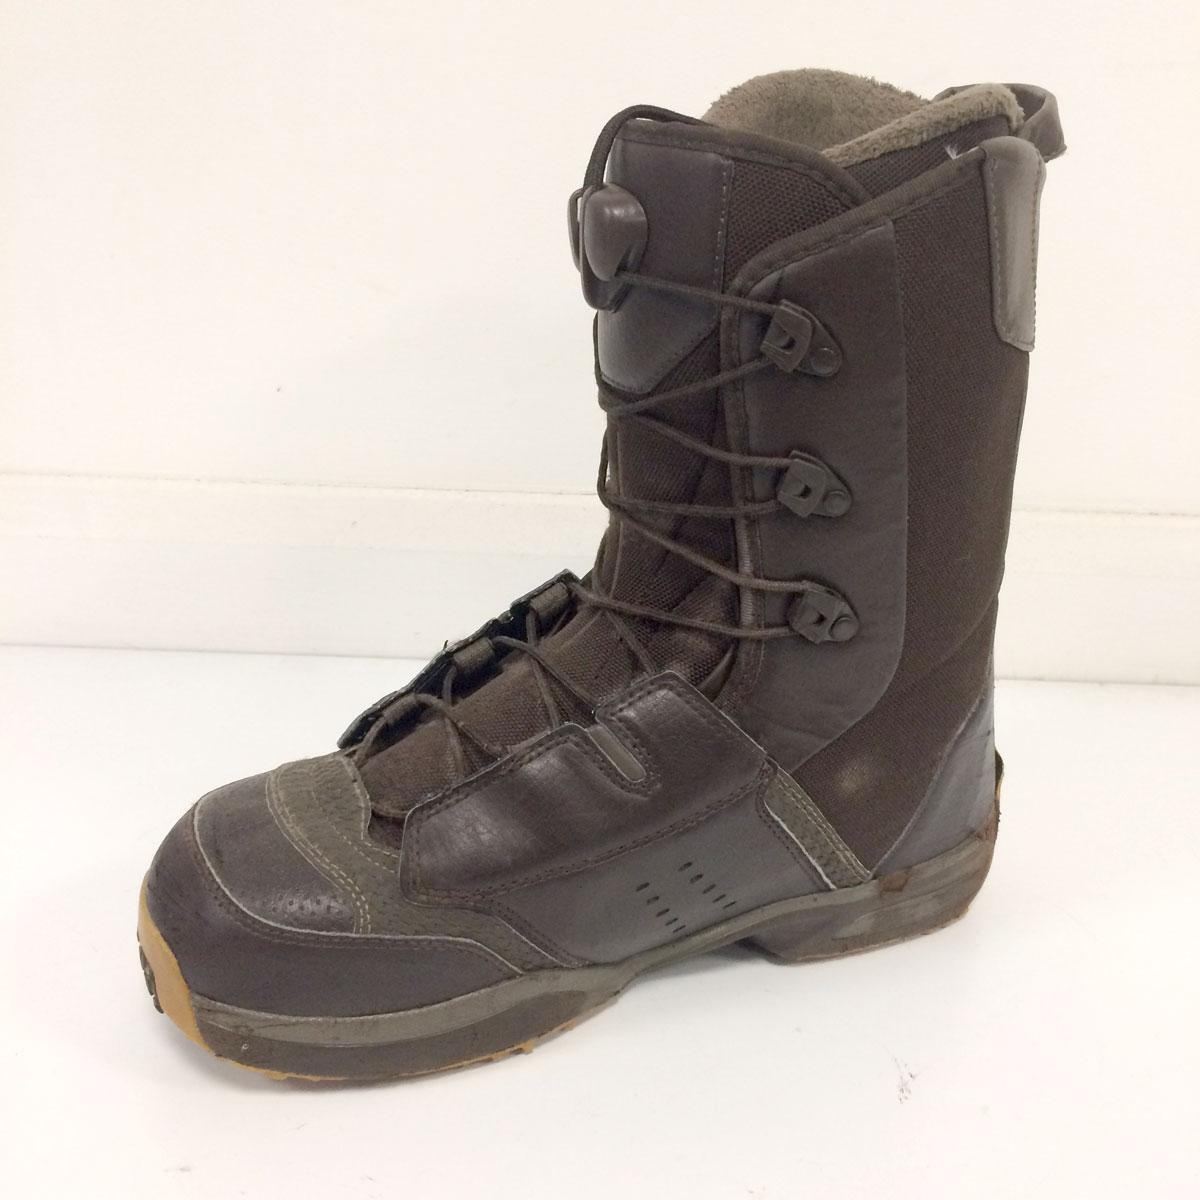 meilleures baskets 9c0a3 757c7 Used Salomon Dialogue Snowboard Boots - Mens UK 9.5 - OK Condition - 6/10